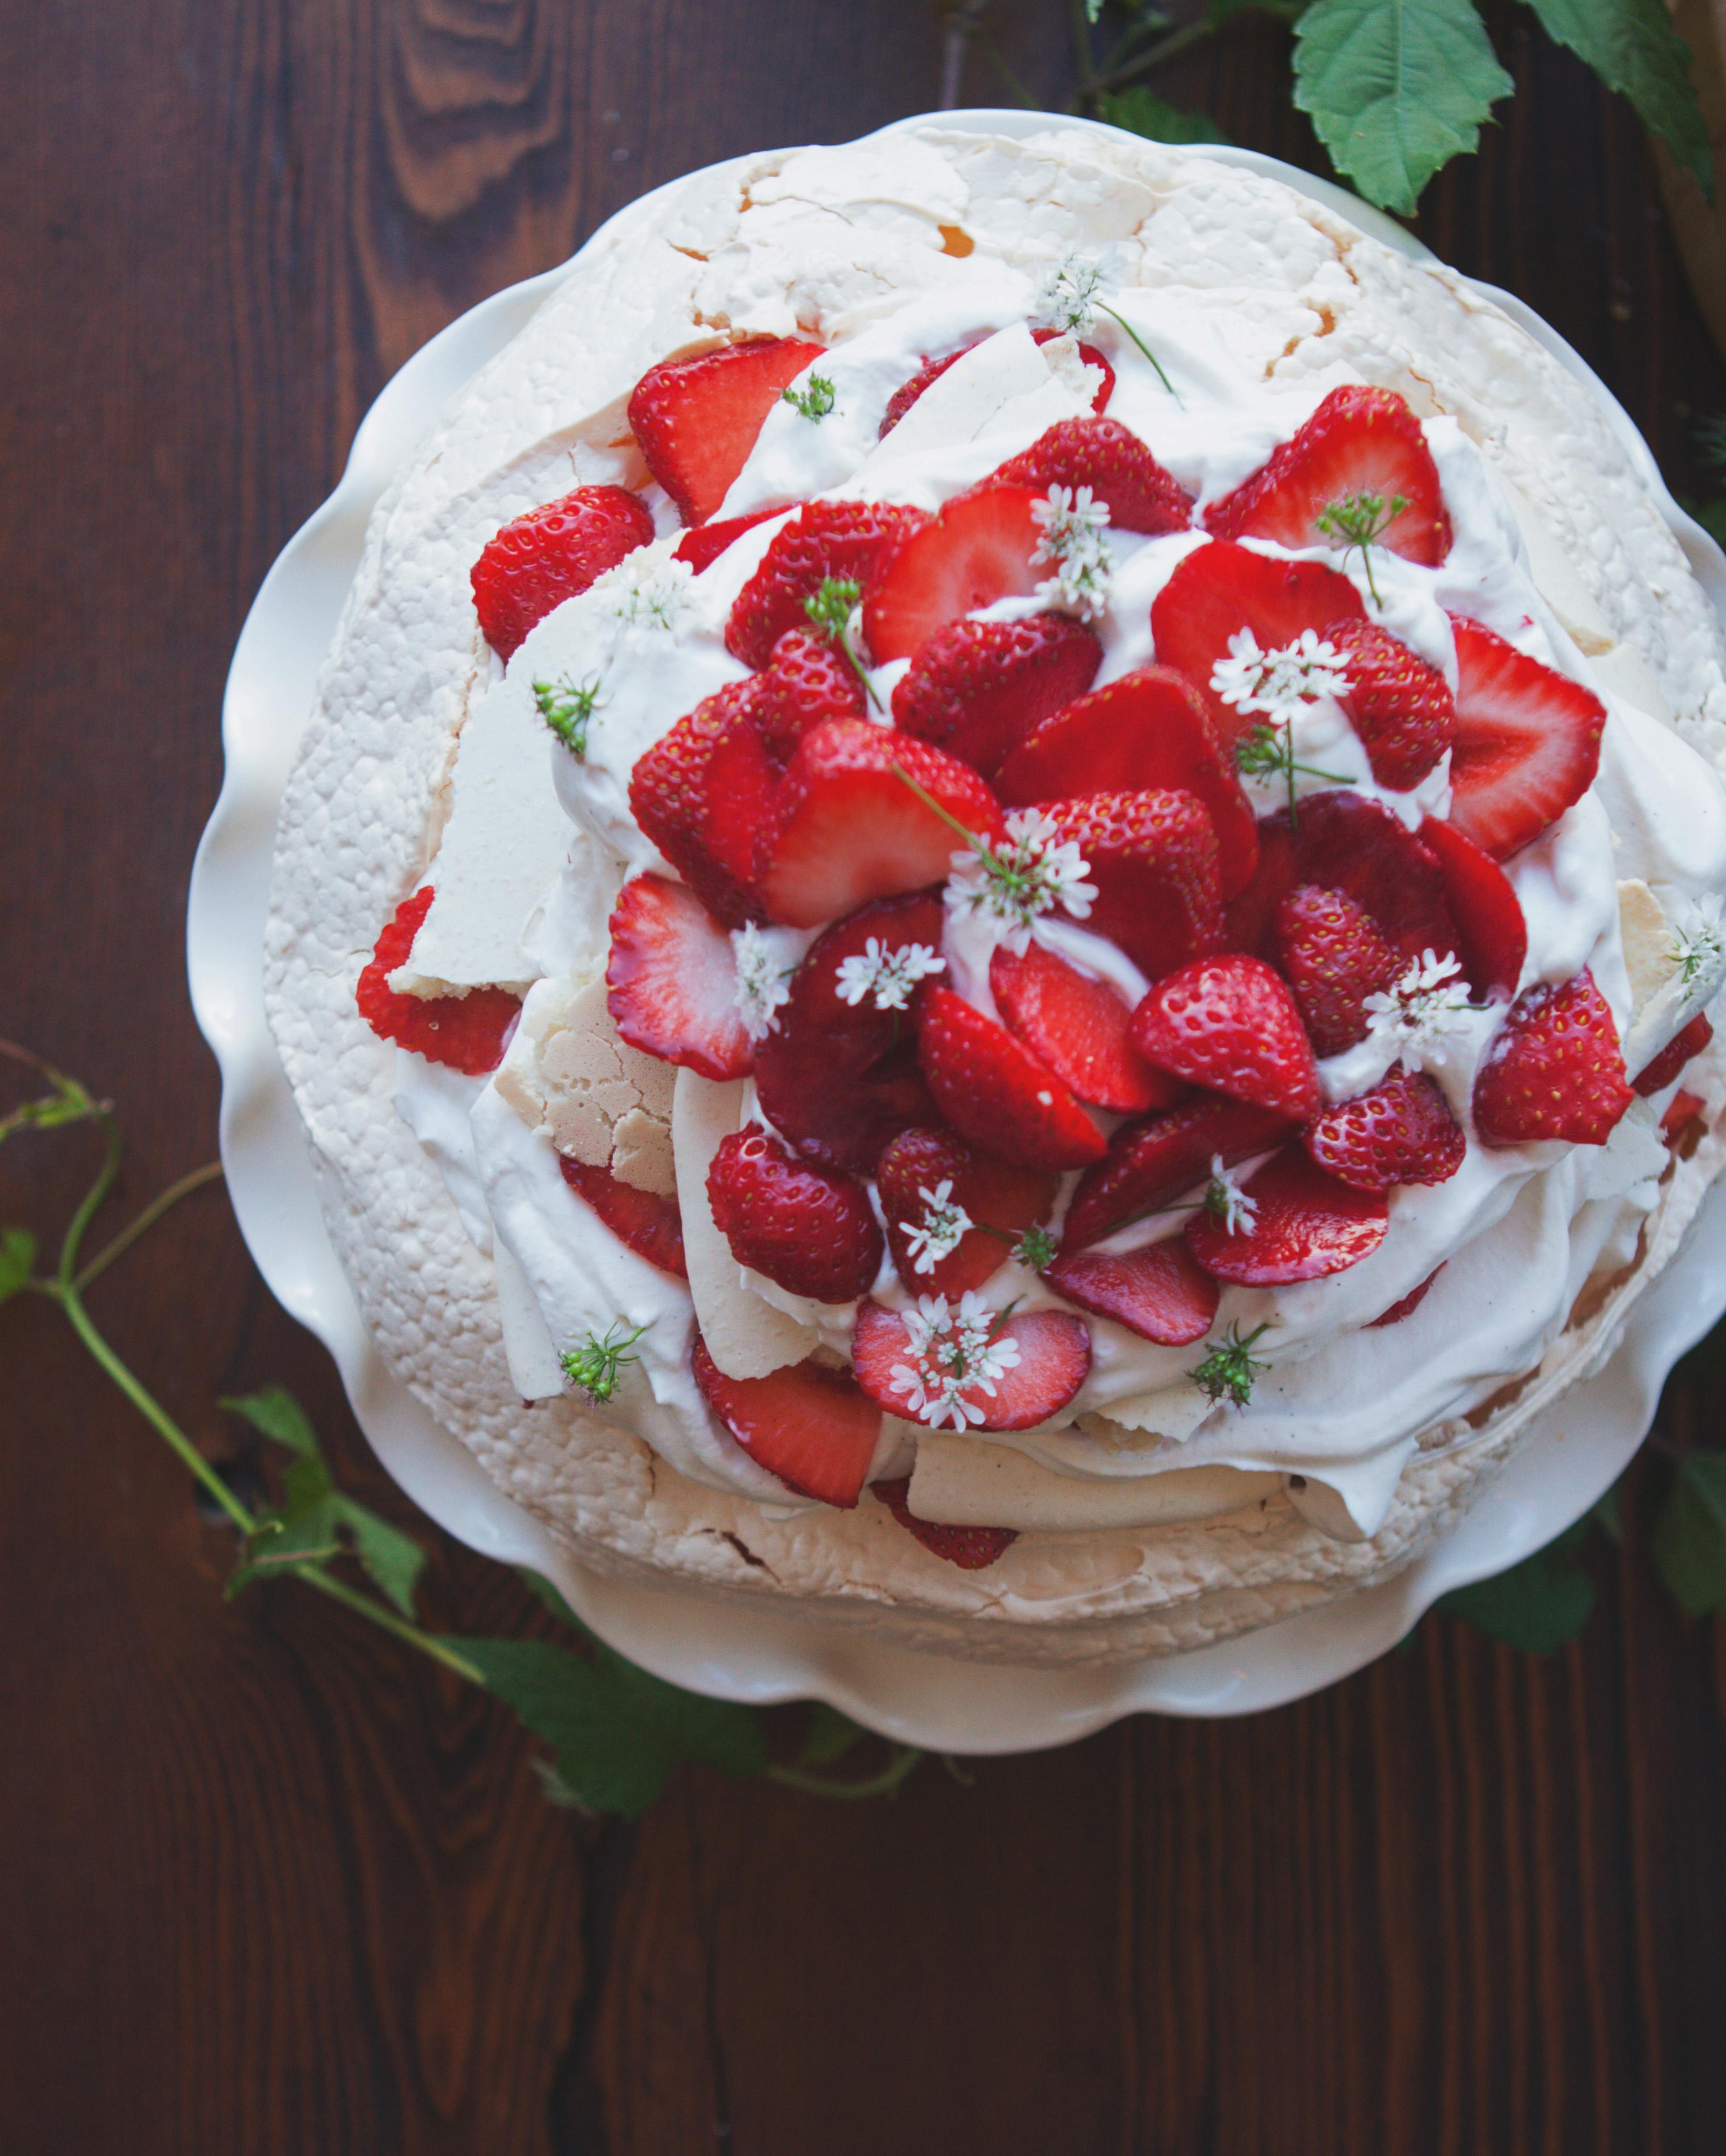 lilly-carter-wedding-cake-00561-s112037-0715..jpg